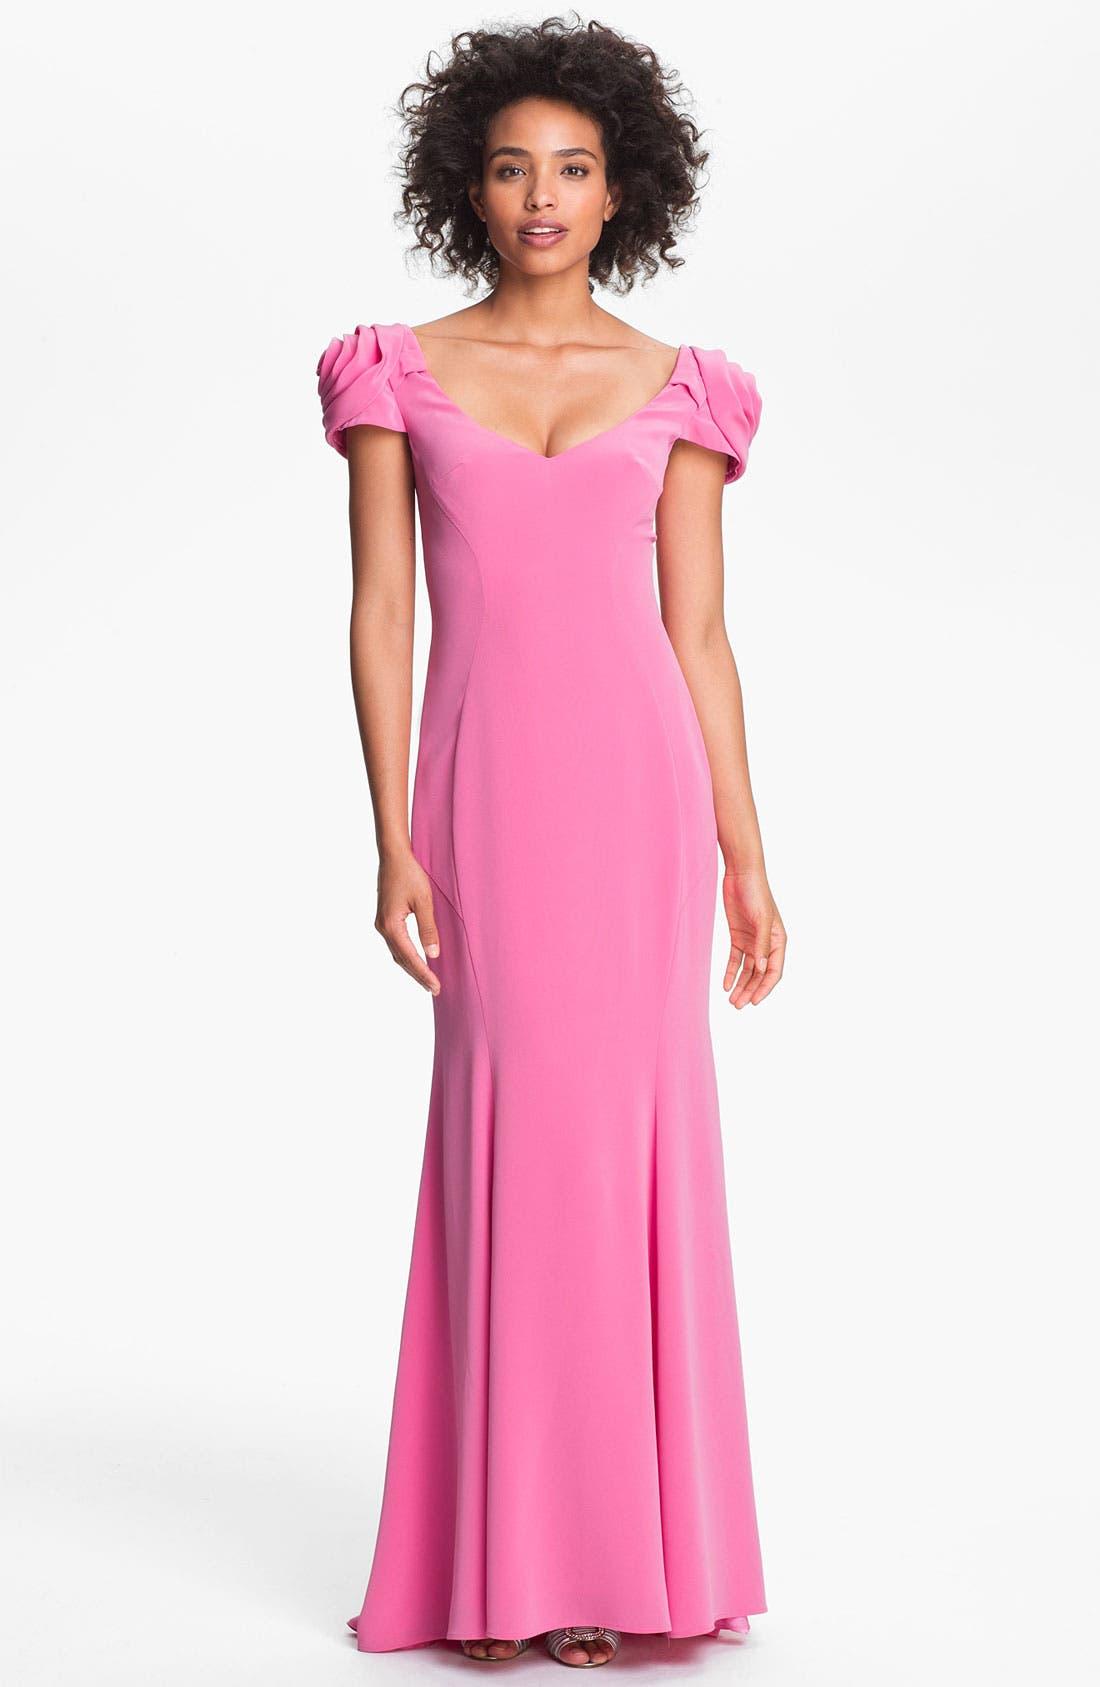 Main Image - A.B.S. by Allen Schwartz Rosette Shoulder Gown